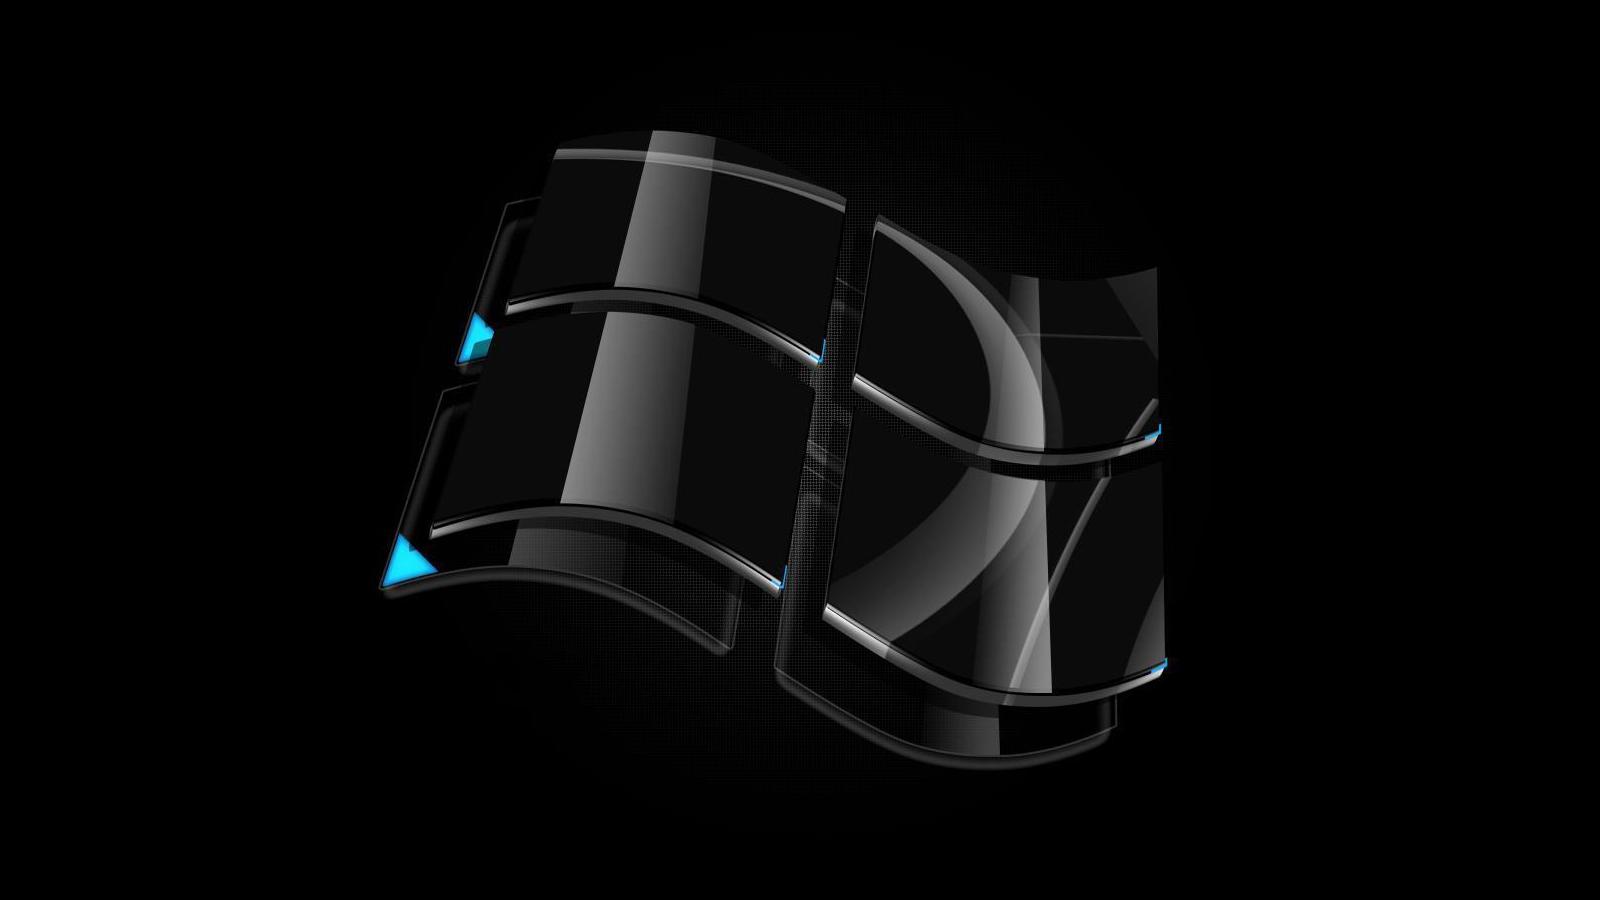 Microsoft Windows Wallpaper 1600x900 Microsoft Windows 1600x900